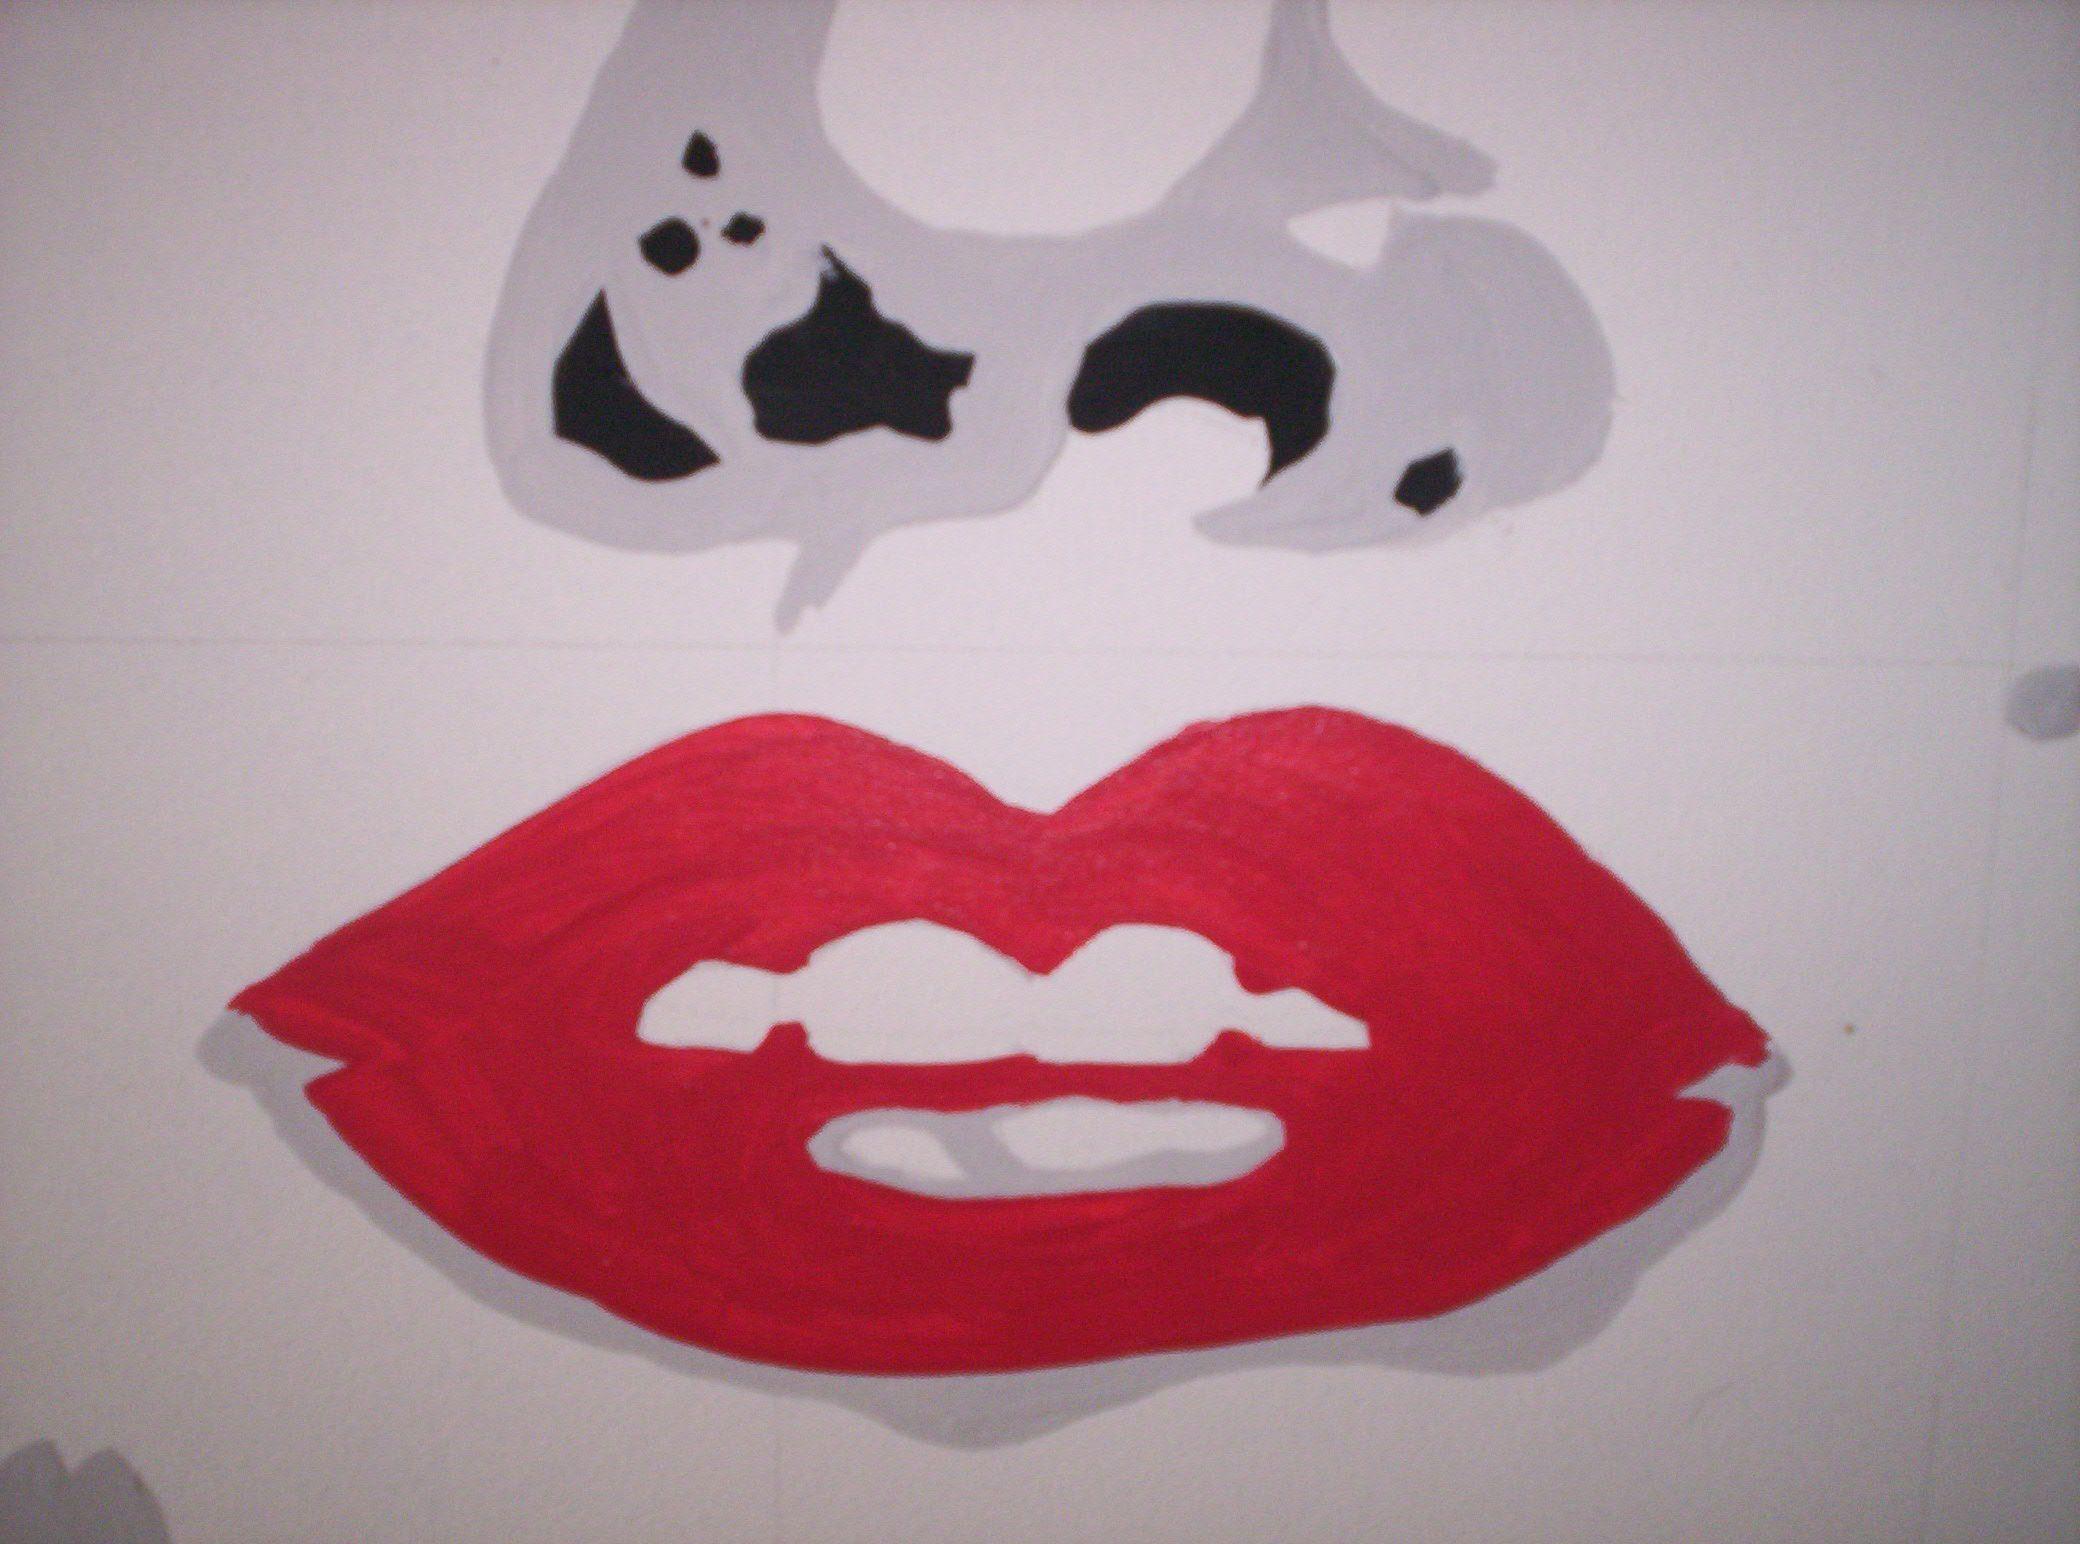 marilyn monroe lips my marilyn monroe photos